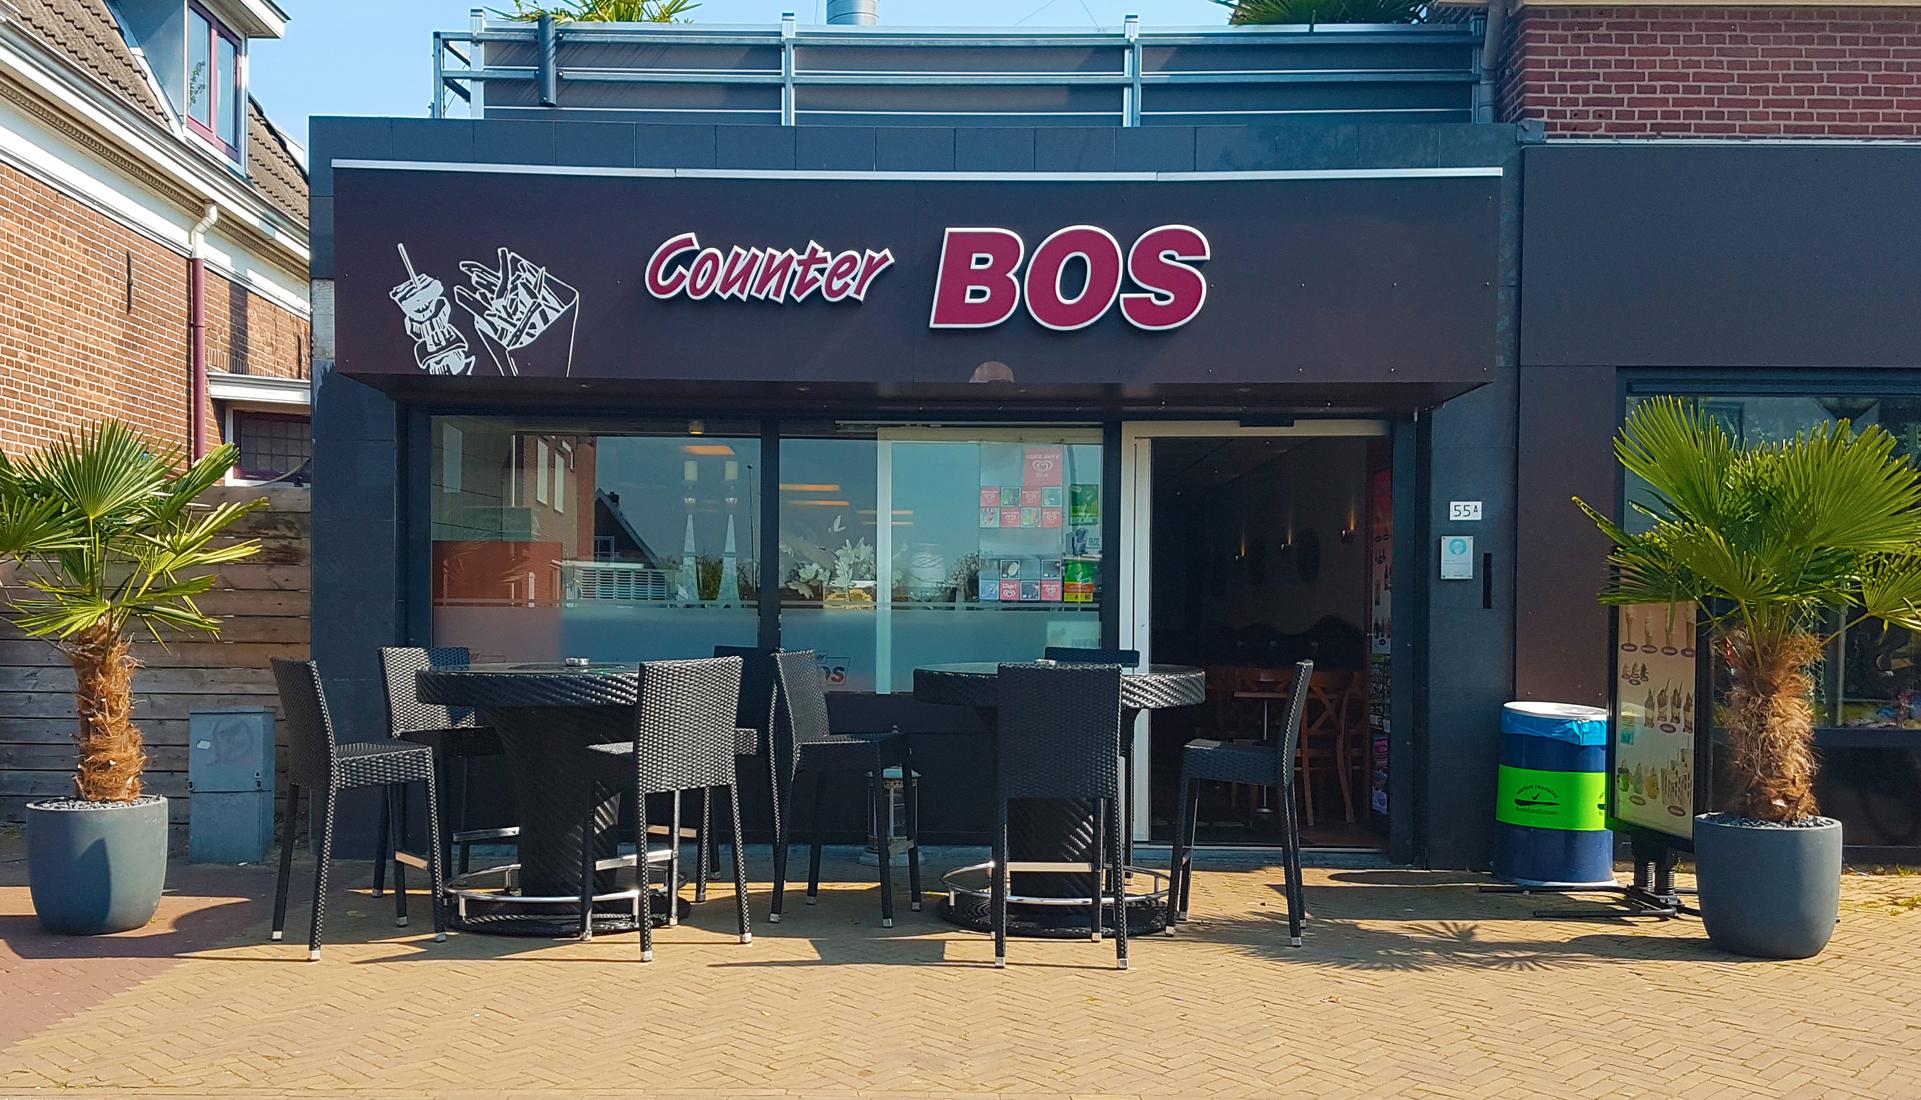 counter bos